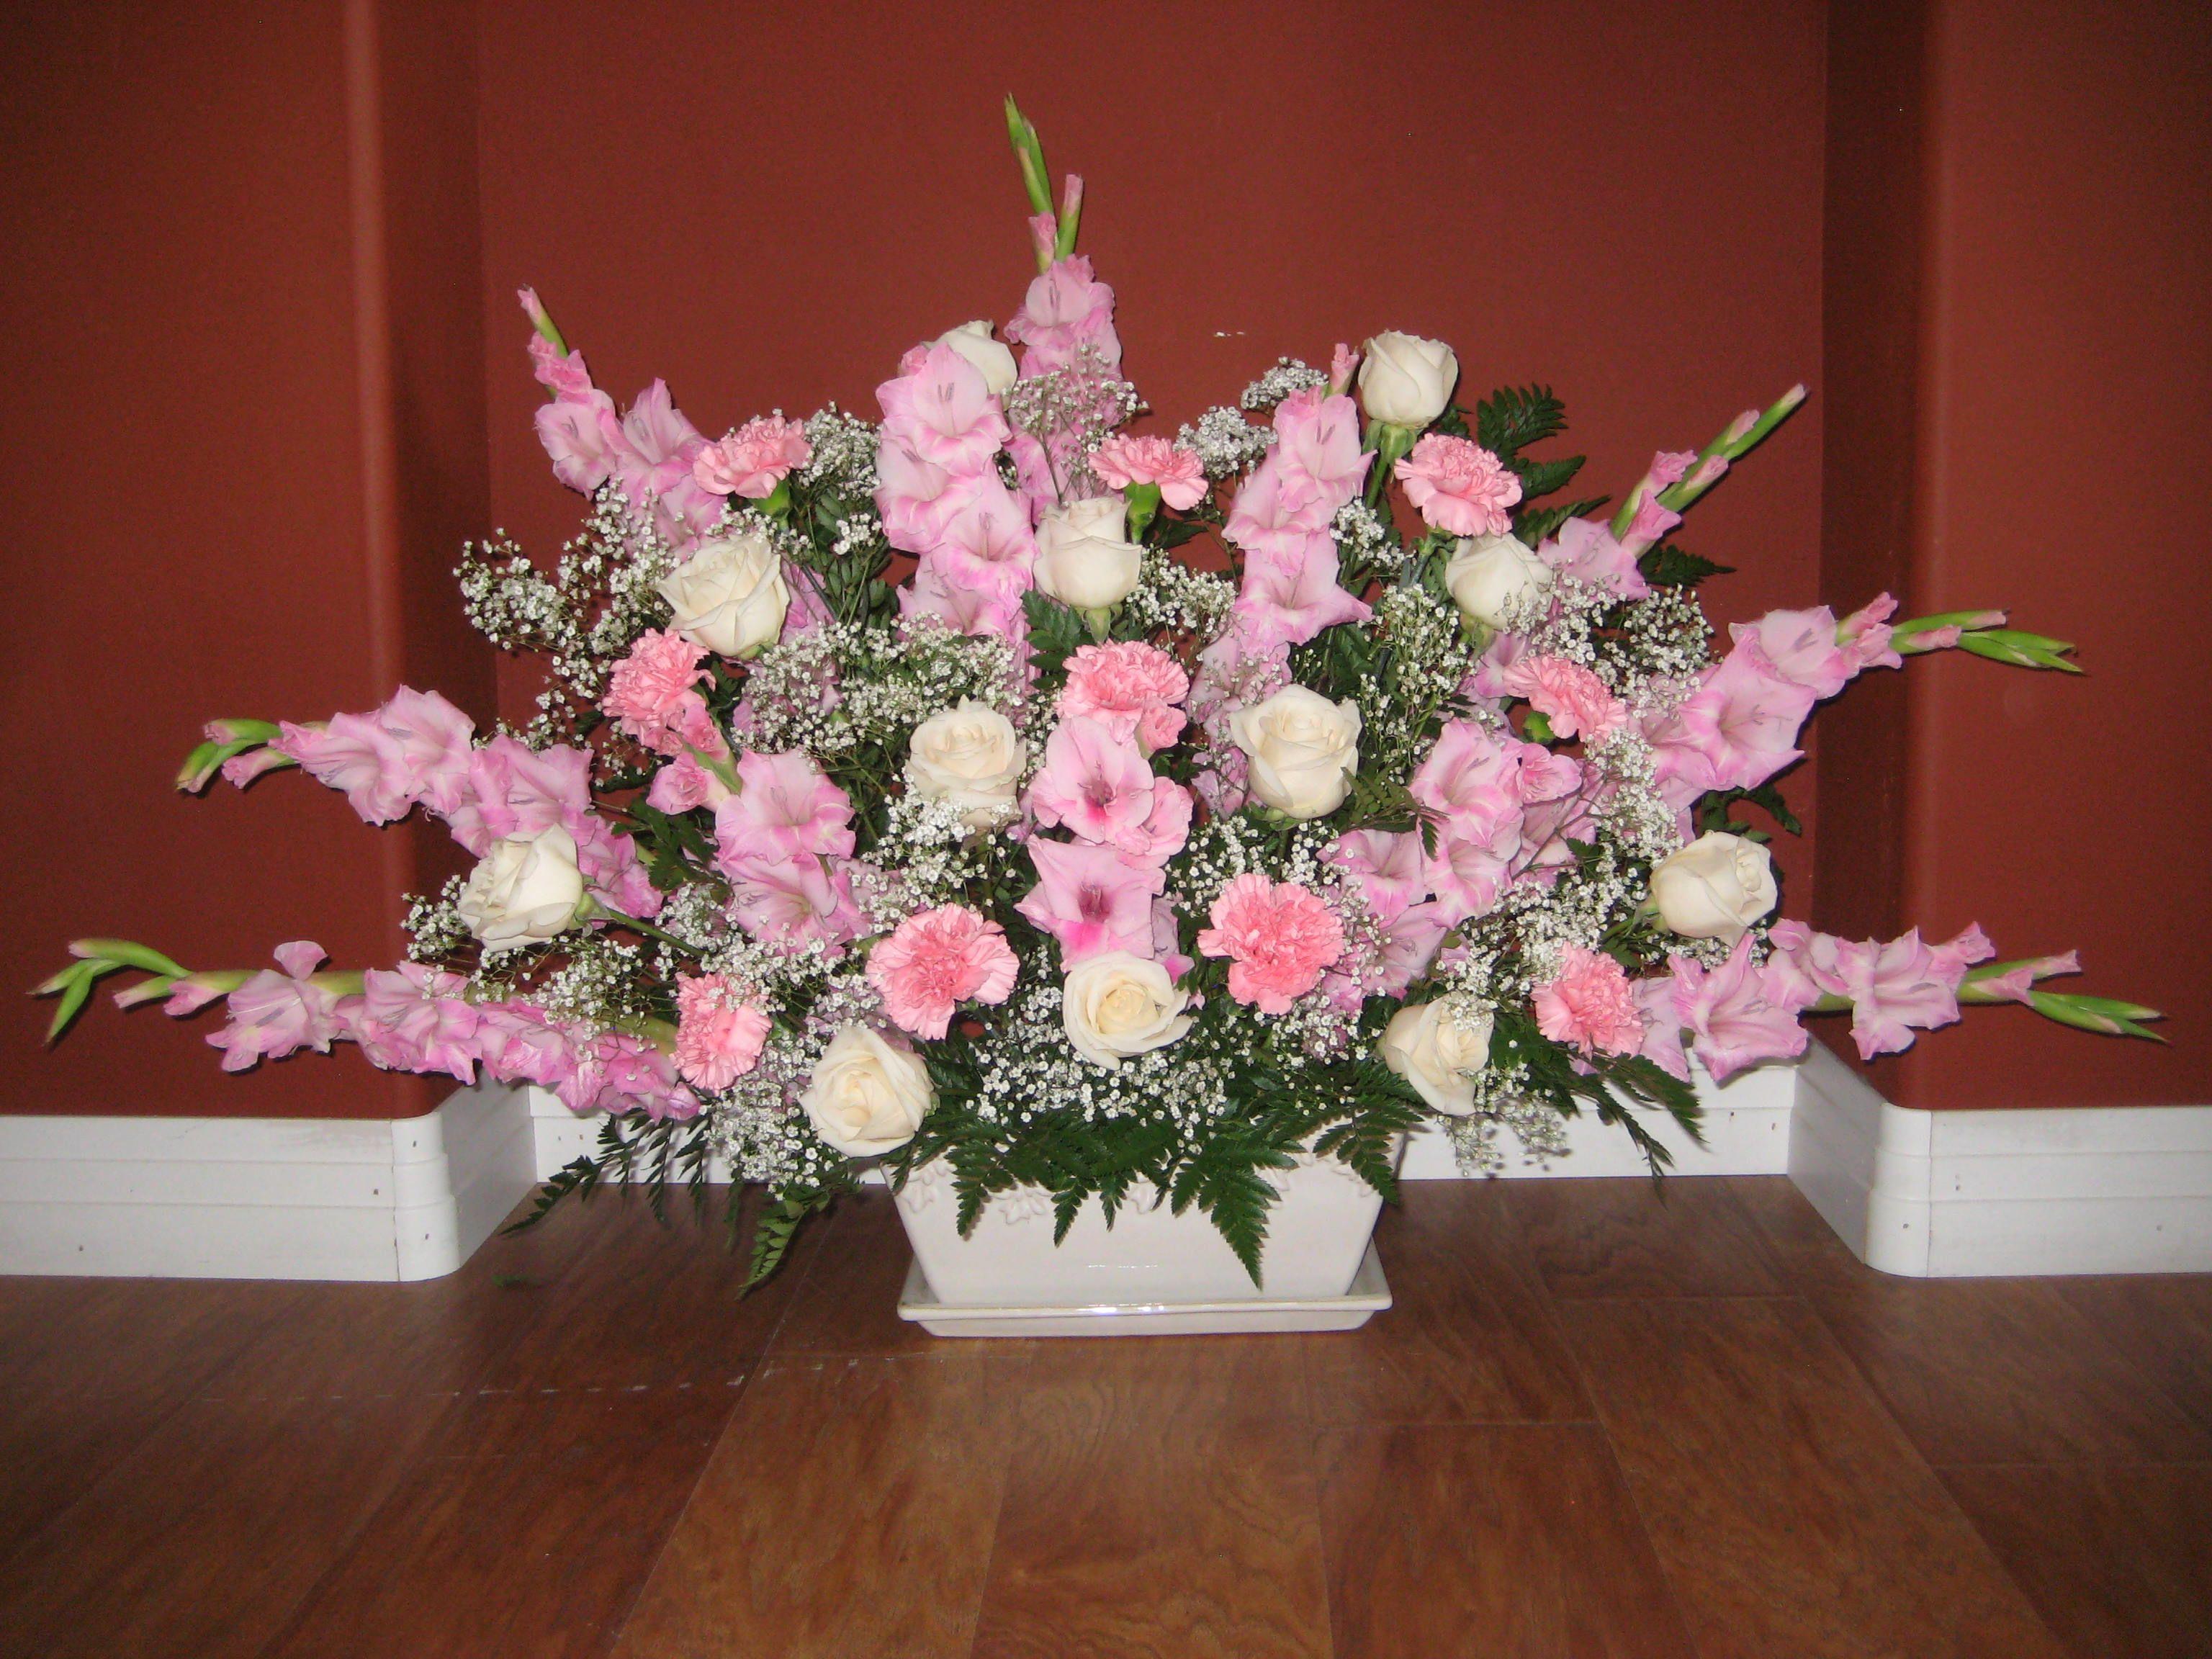 Large Bouquet Of Pink Gladiolas Pink Carnations Cream Roses Baby S Breath This Was A Celebra Funeral Arrangements Flower Arrangements Floral Arrangements